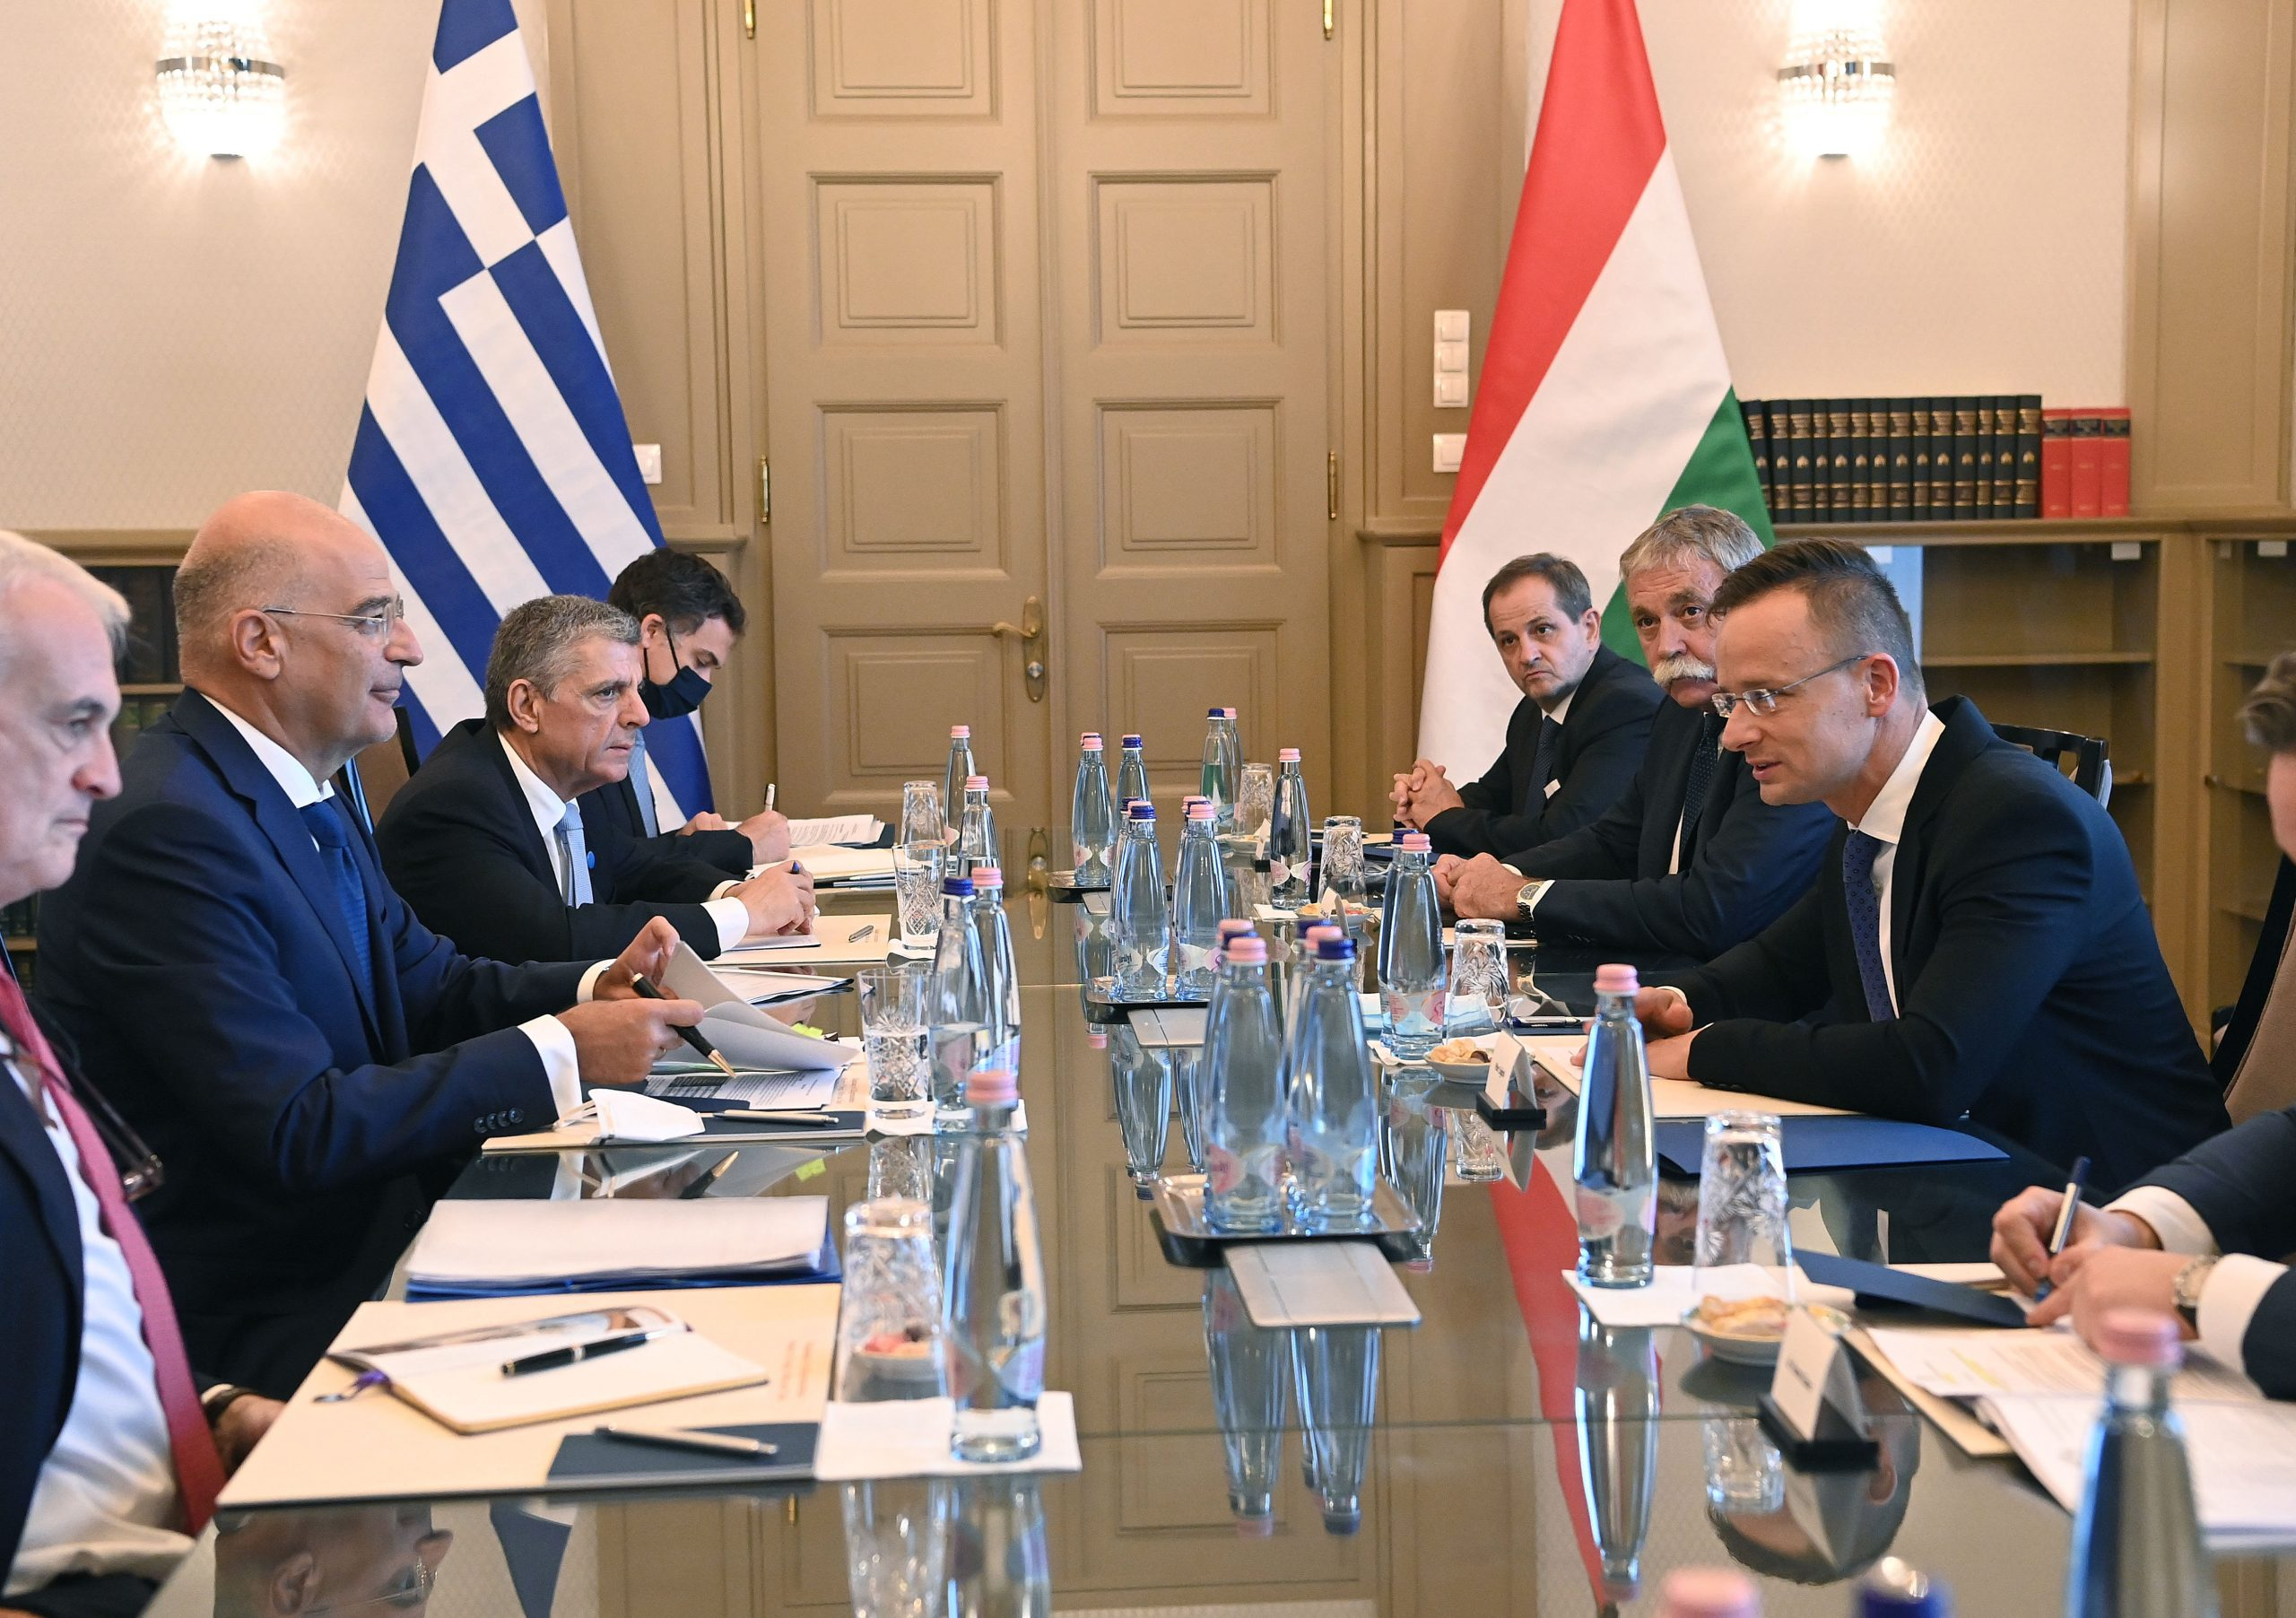 FM Szijjártó: EU Must Clearly Communicate Border Crossing Criteria post's picture